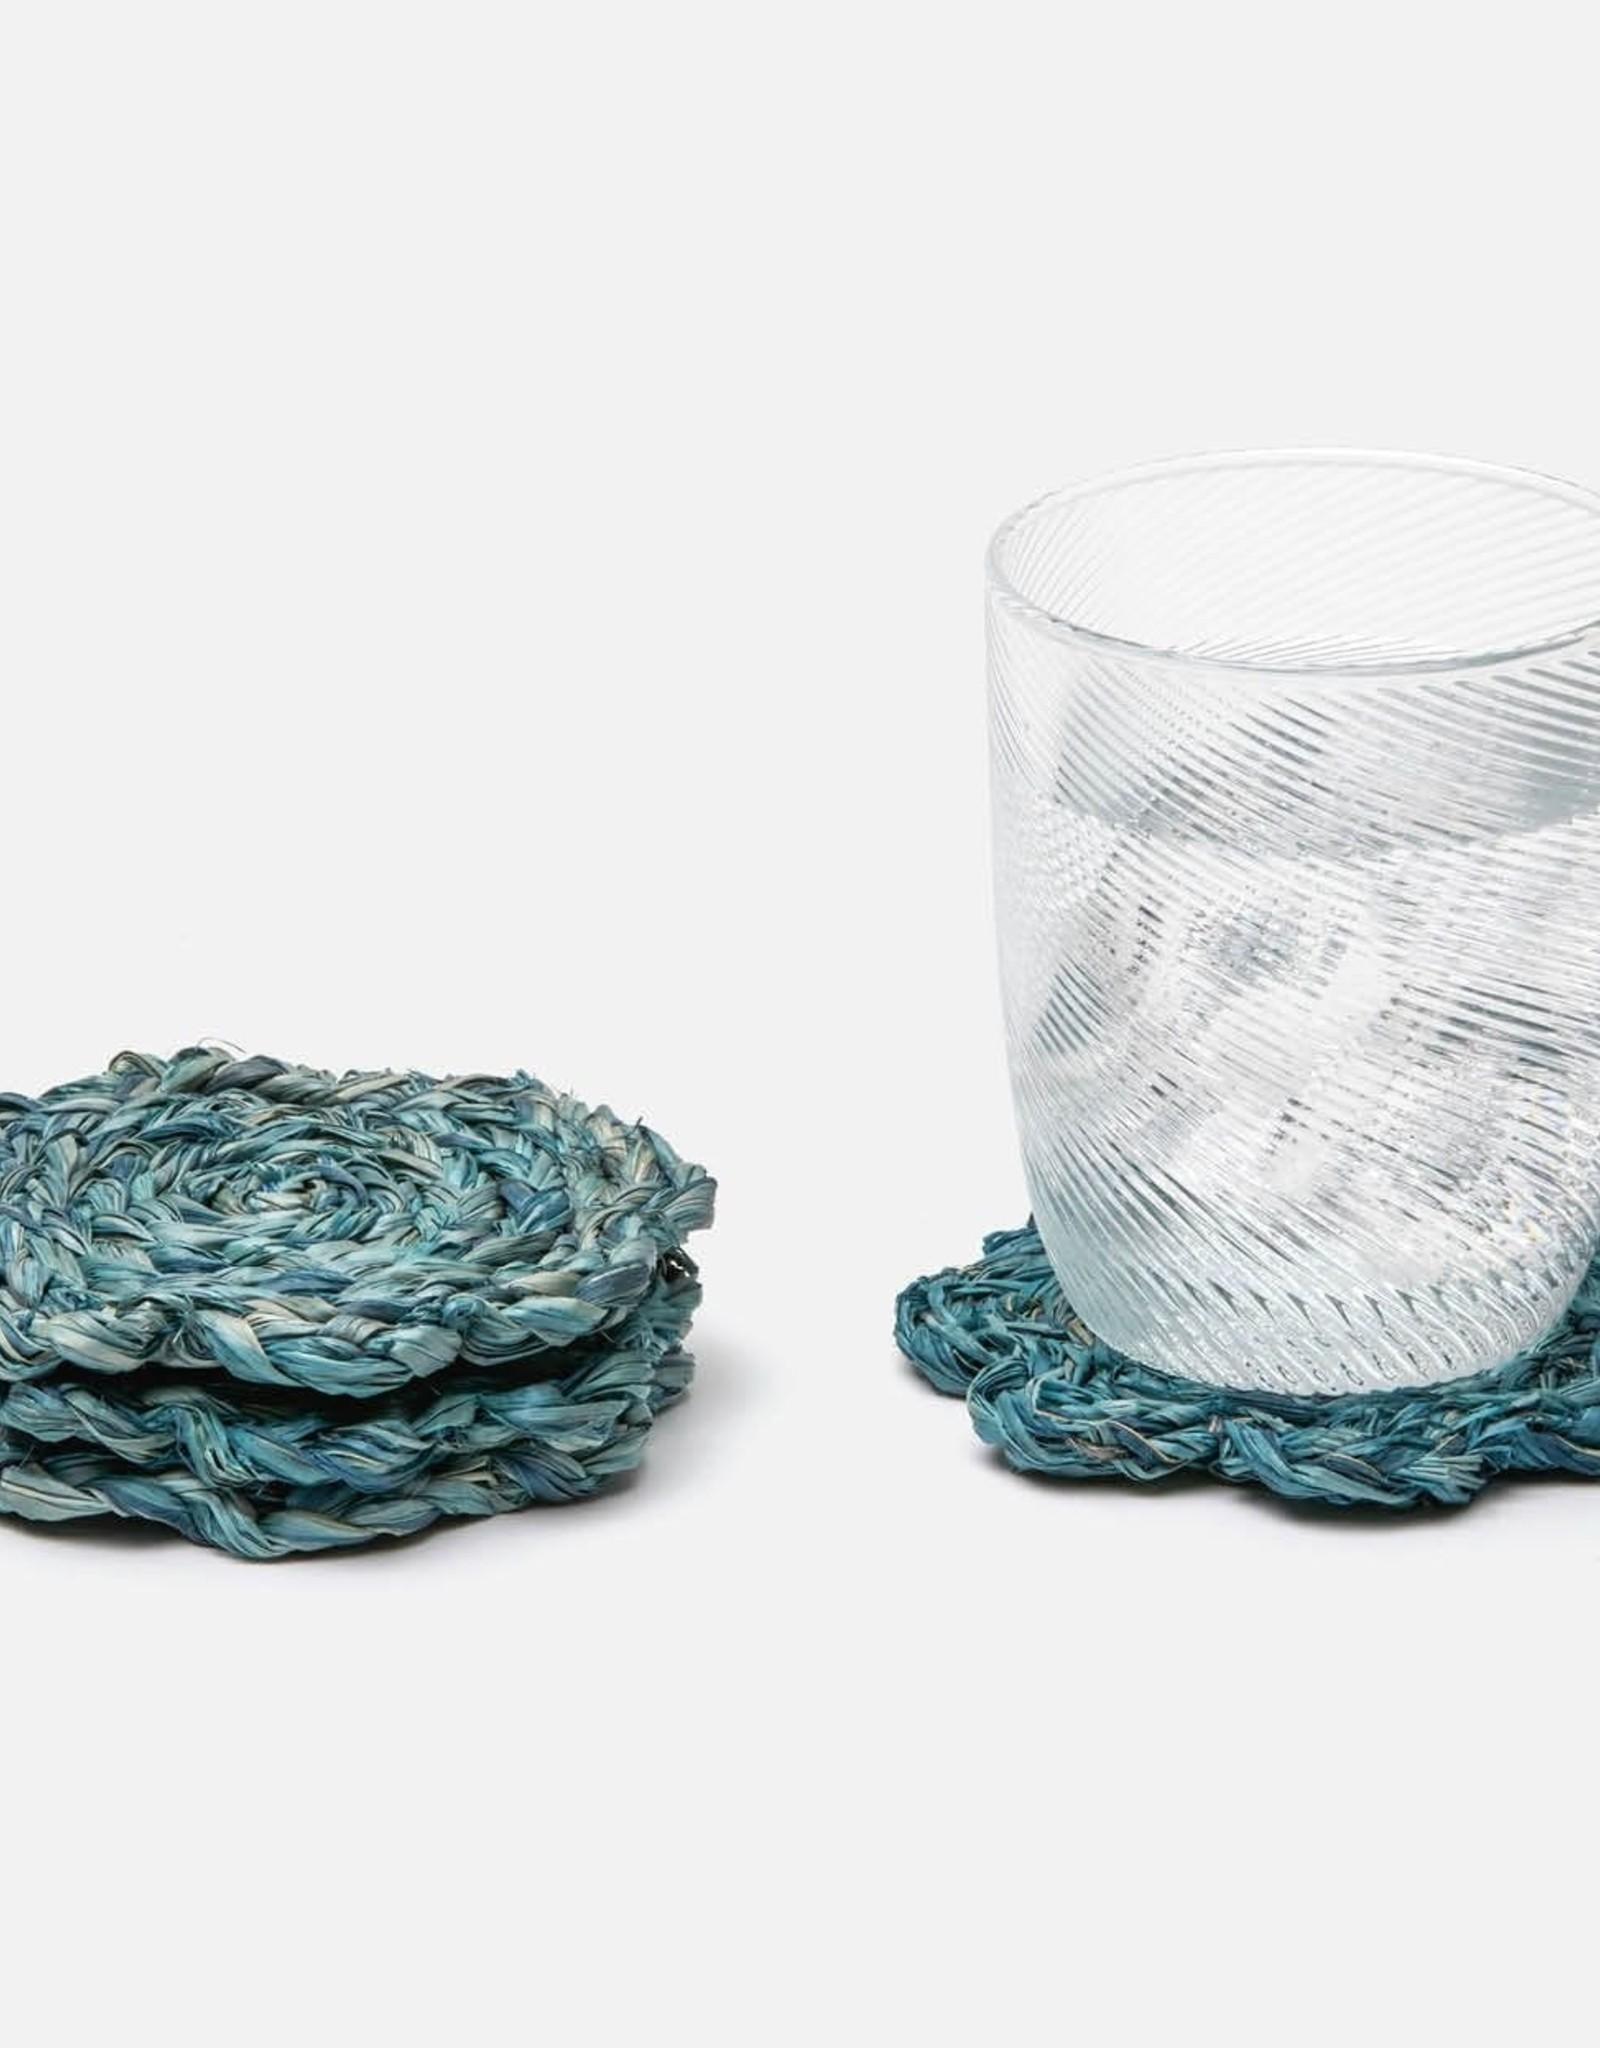 Blue Pheasant Vera Flower Coasters - Set of 4